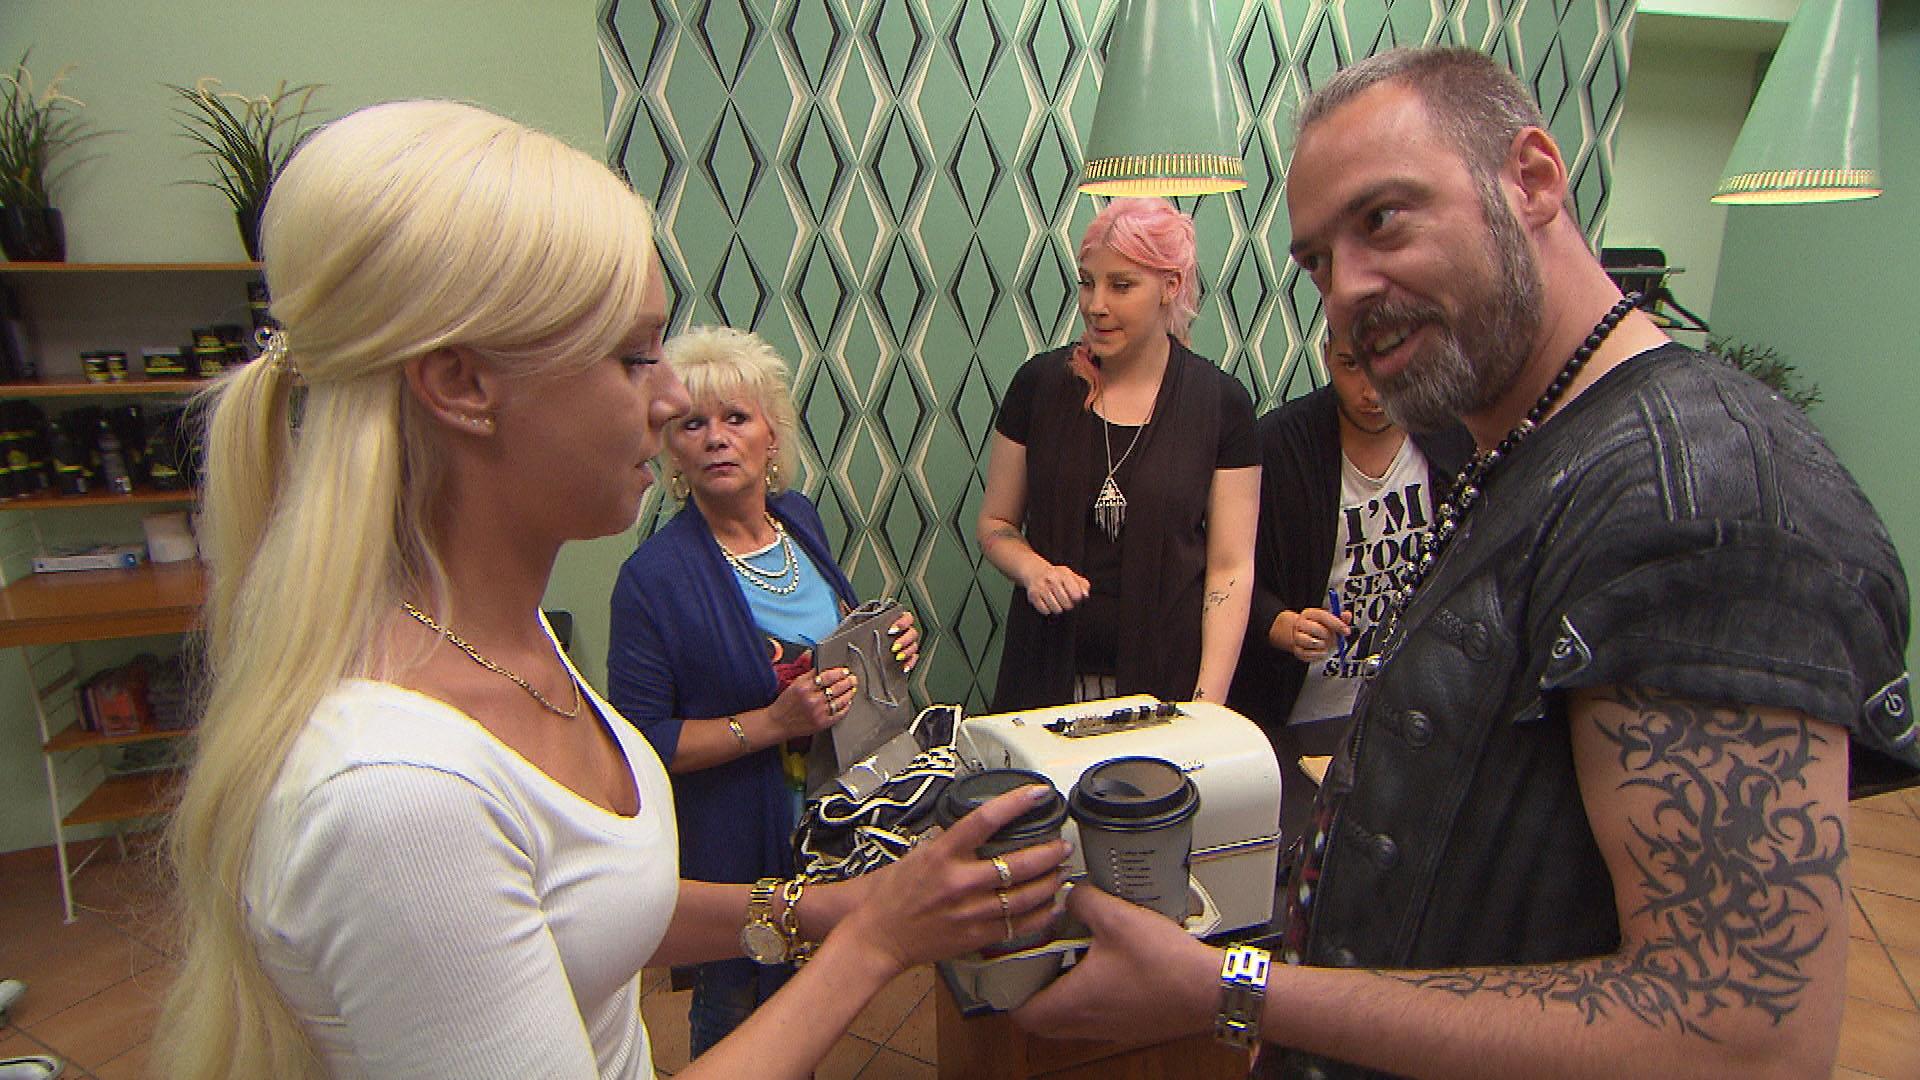 Peggy+Inge+Paula+Rick+Theo (Quelle: RTL 2)